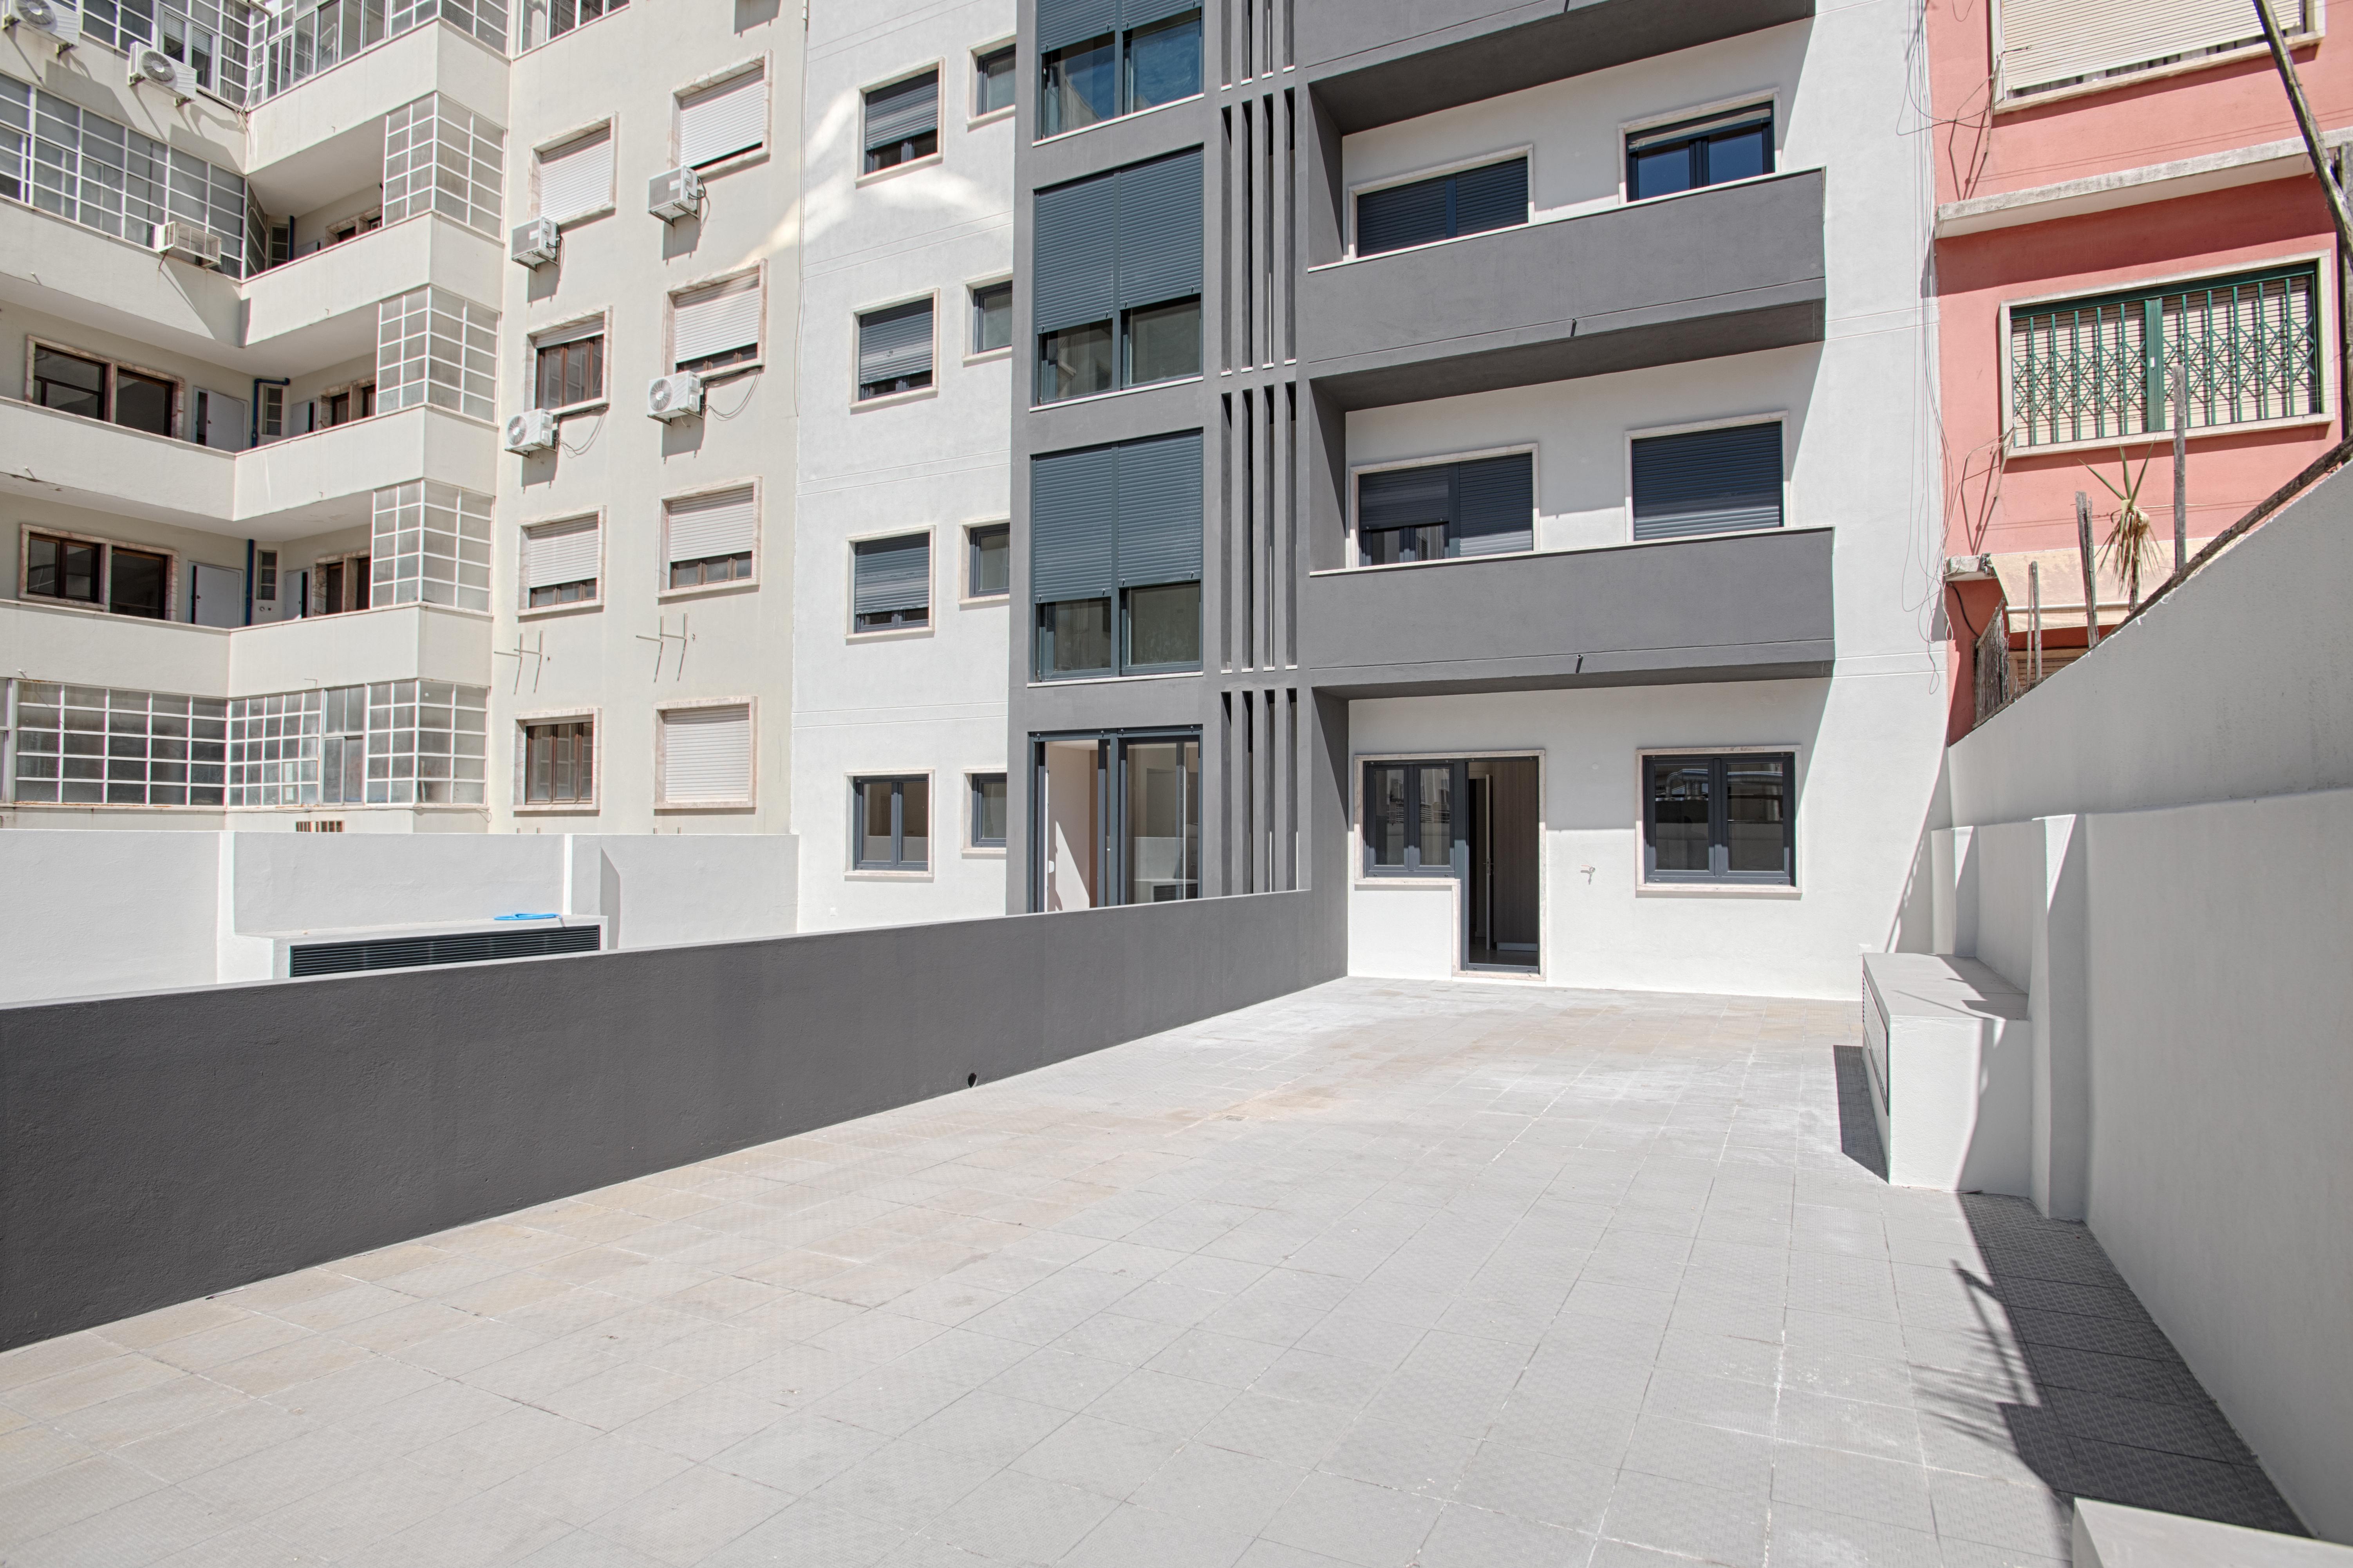 PF017 LX Rua Jose Carlos dos Santos 2